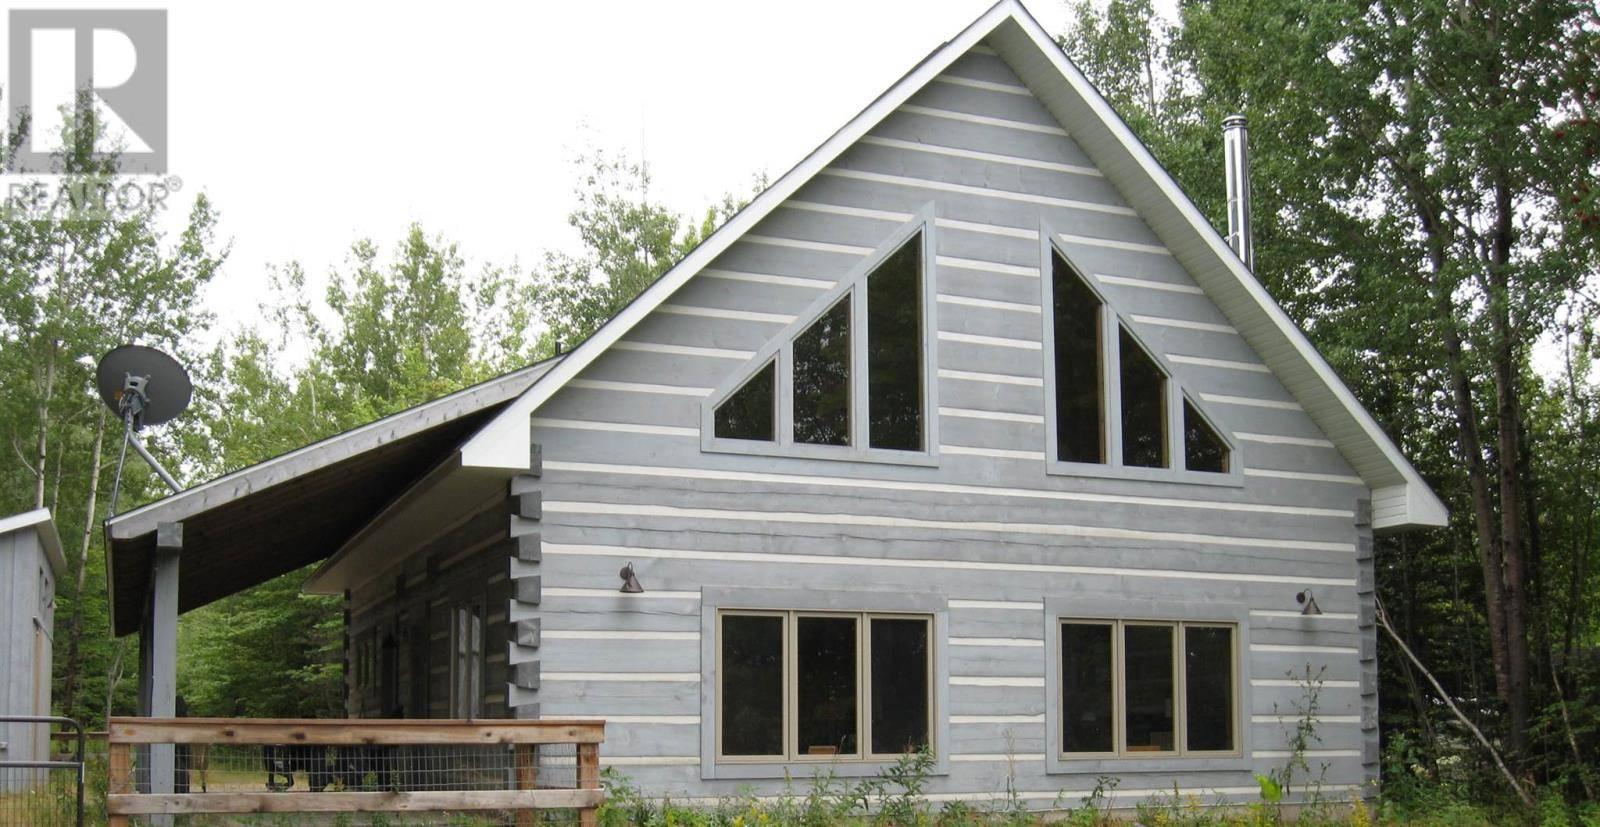 House for sale at 856 Four Season Dr Goulais River Ontario - MLS: SM127021